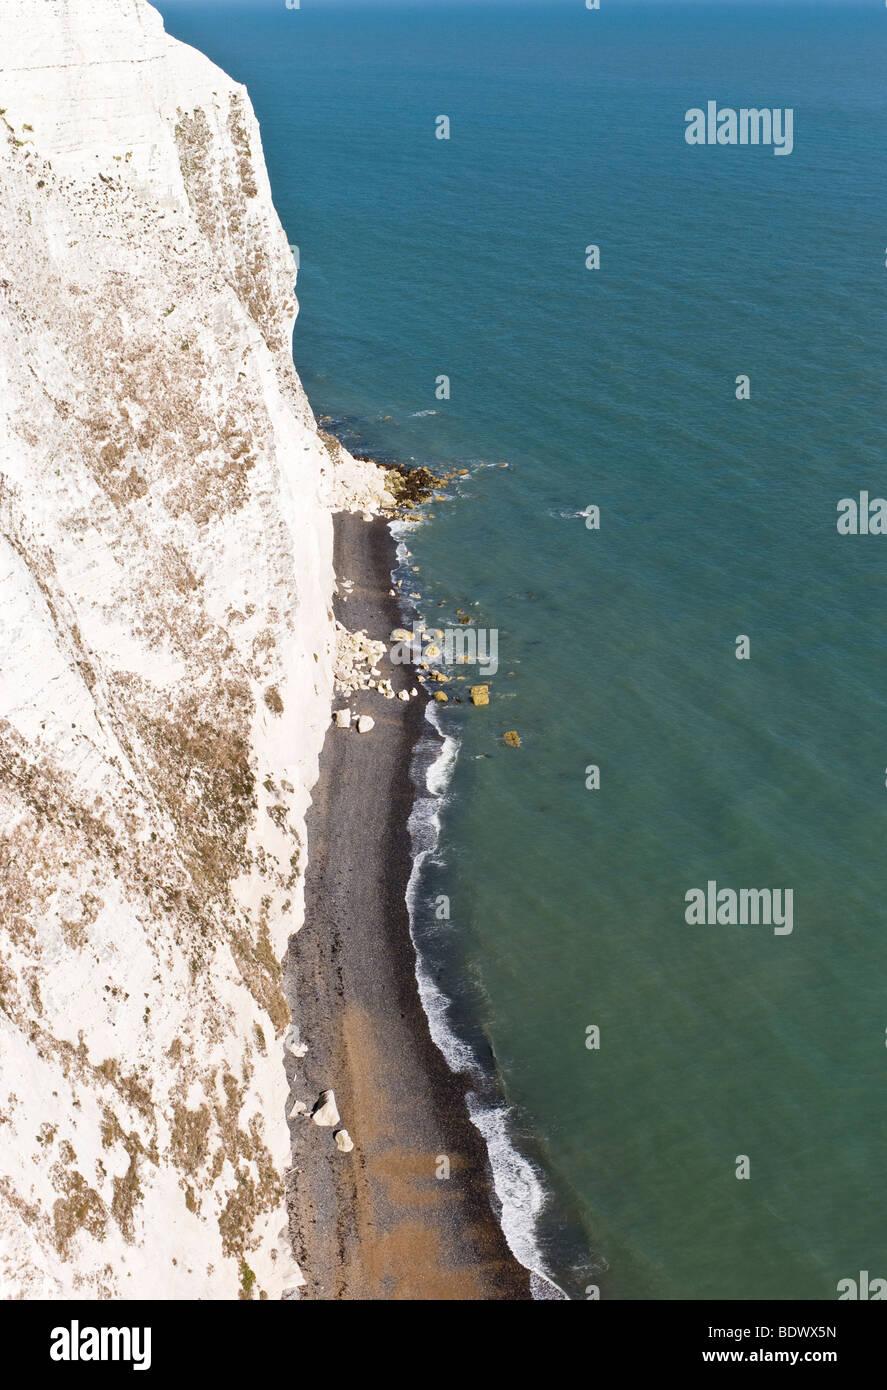 The White Cliffs, Langdon Cliffs, Dover, Kent, UK - Stock Image